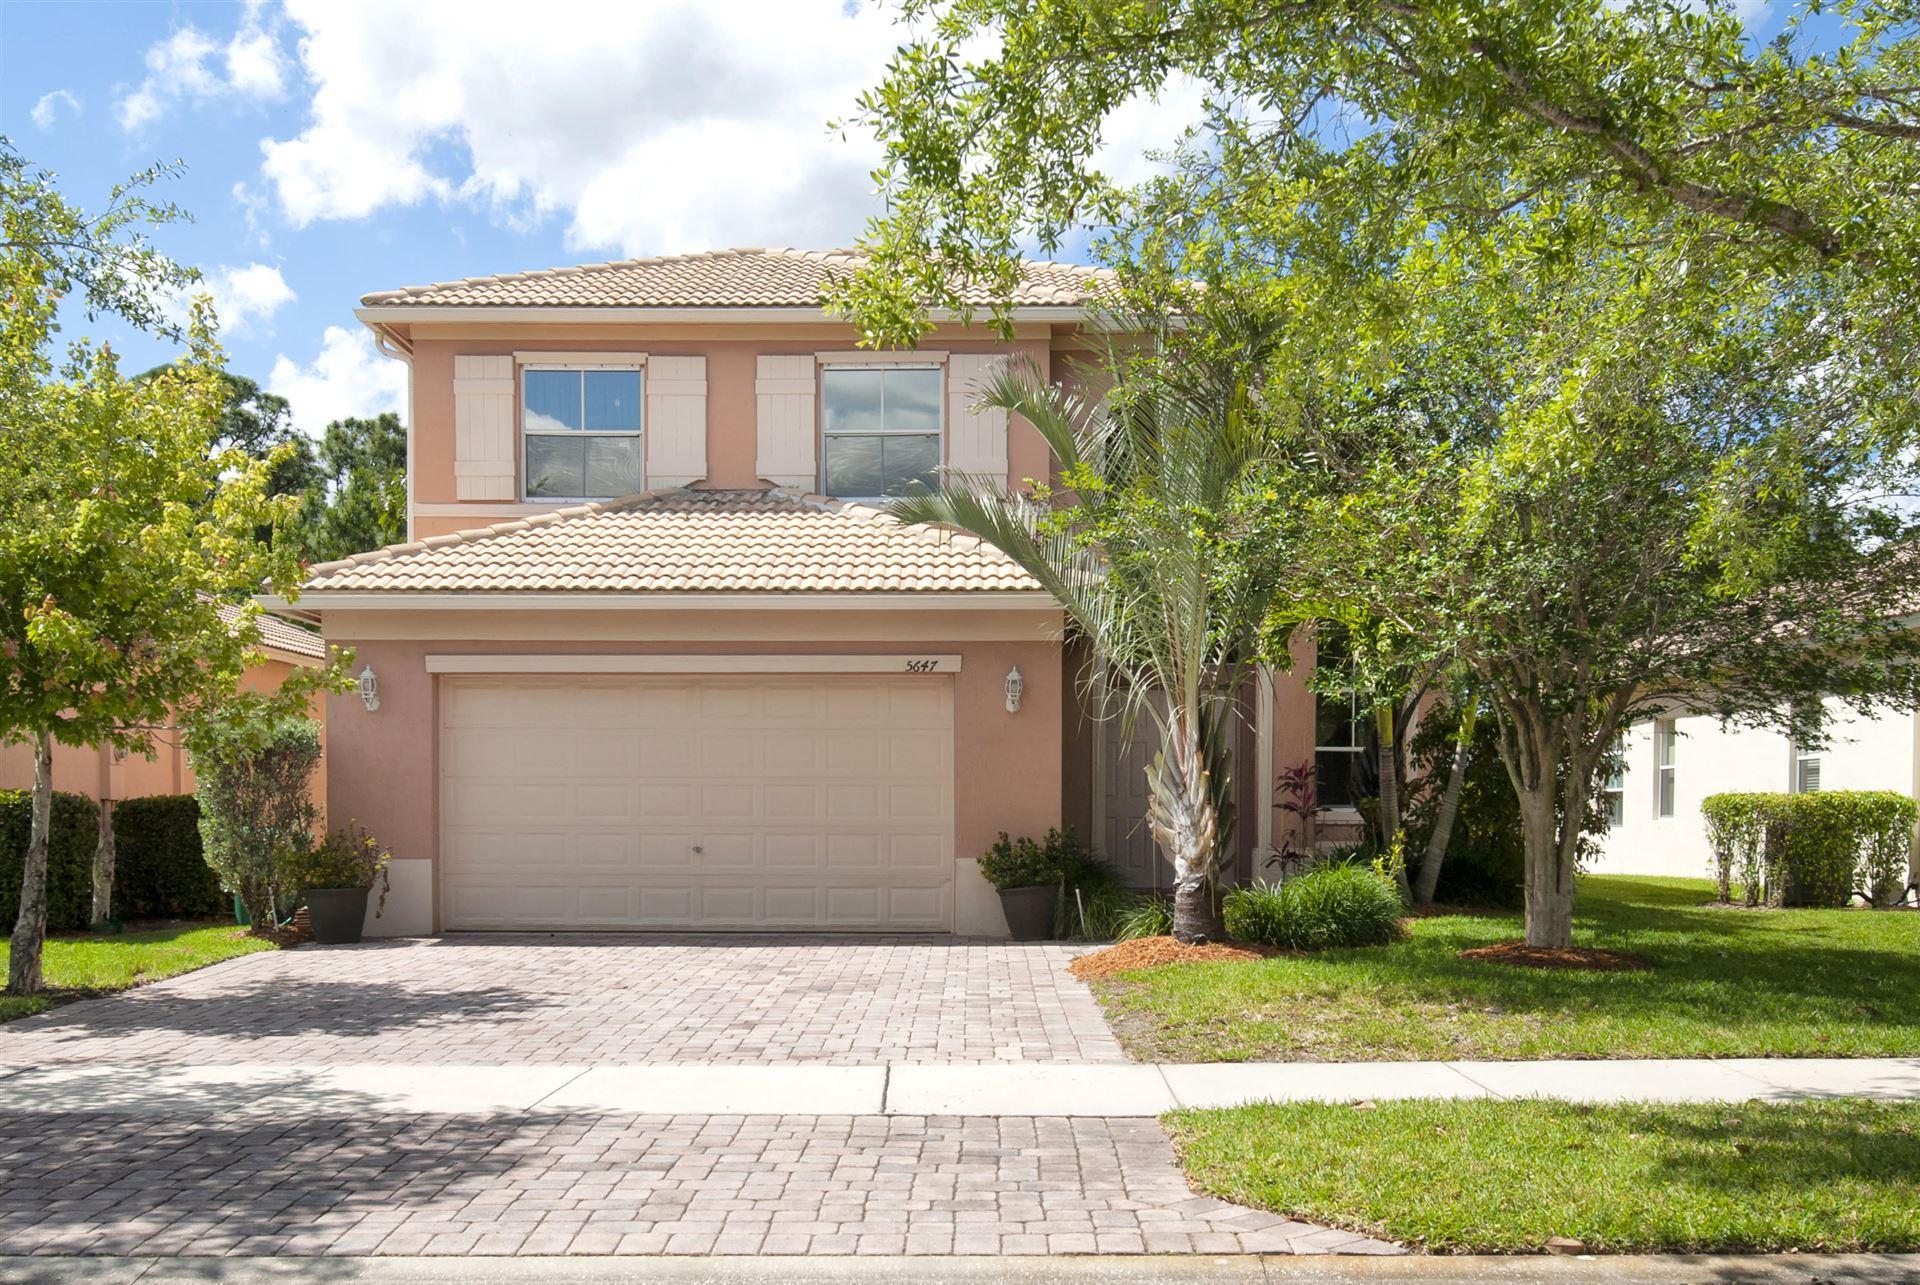 5647 Sunberry Circle, Fort Pierce, FL 34951 - #: RX-10690253